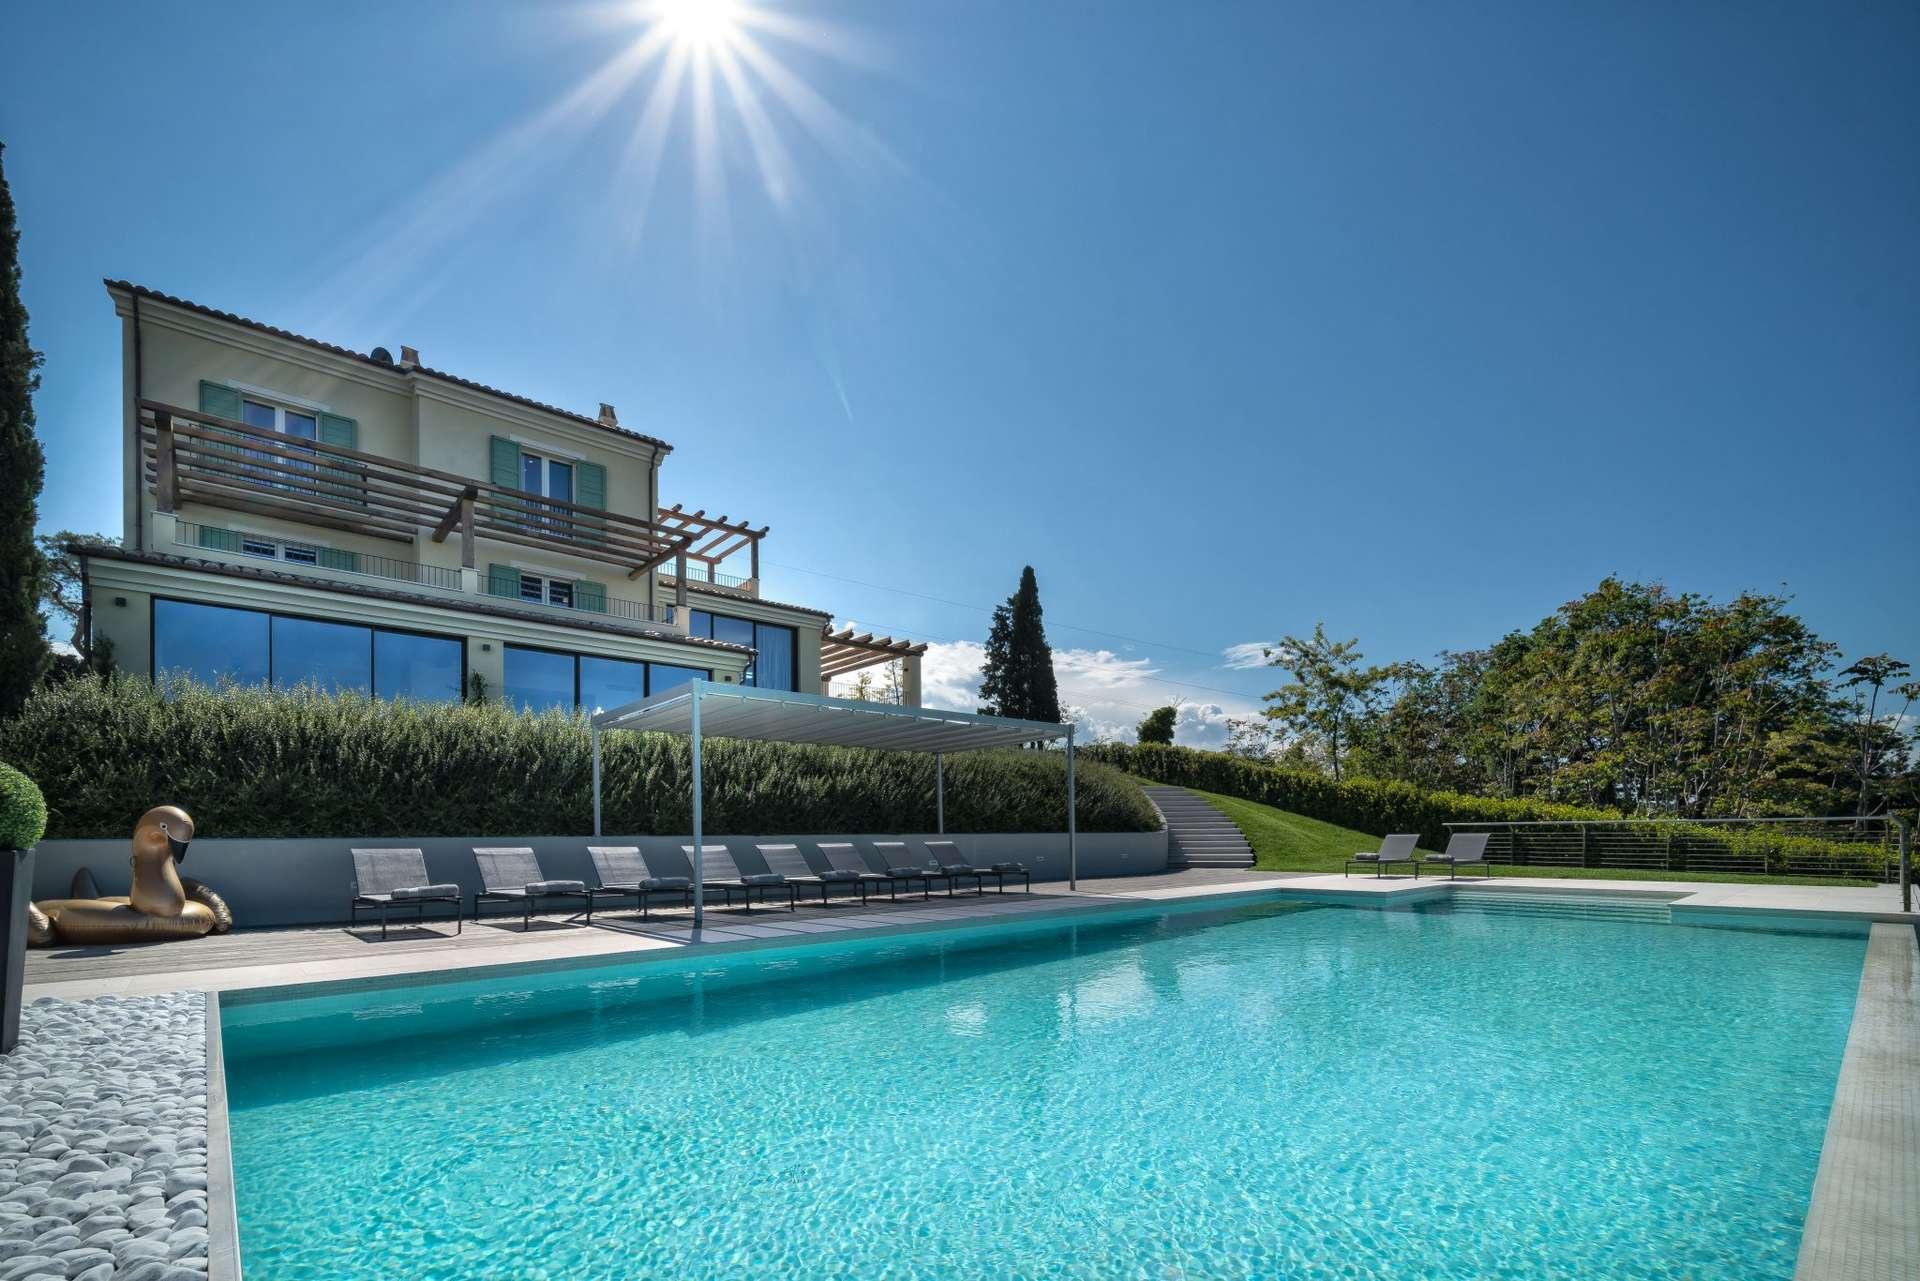 - Villa Olivo - Image 1/18